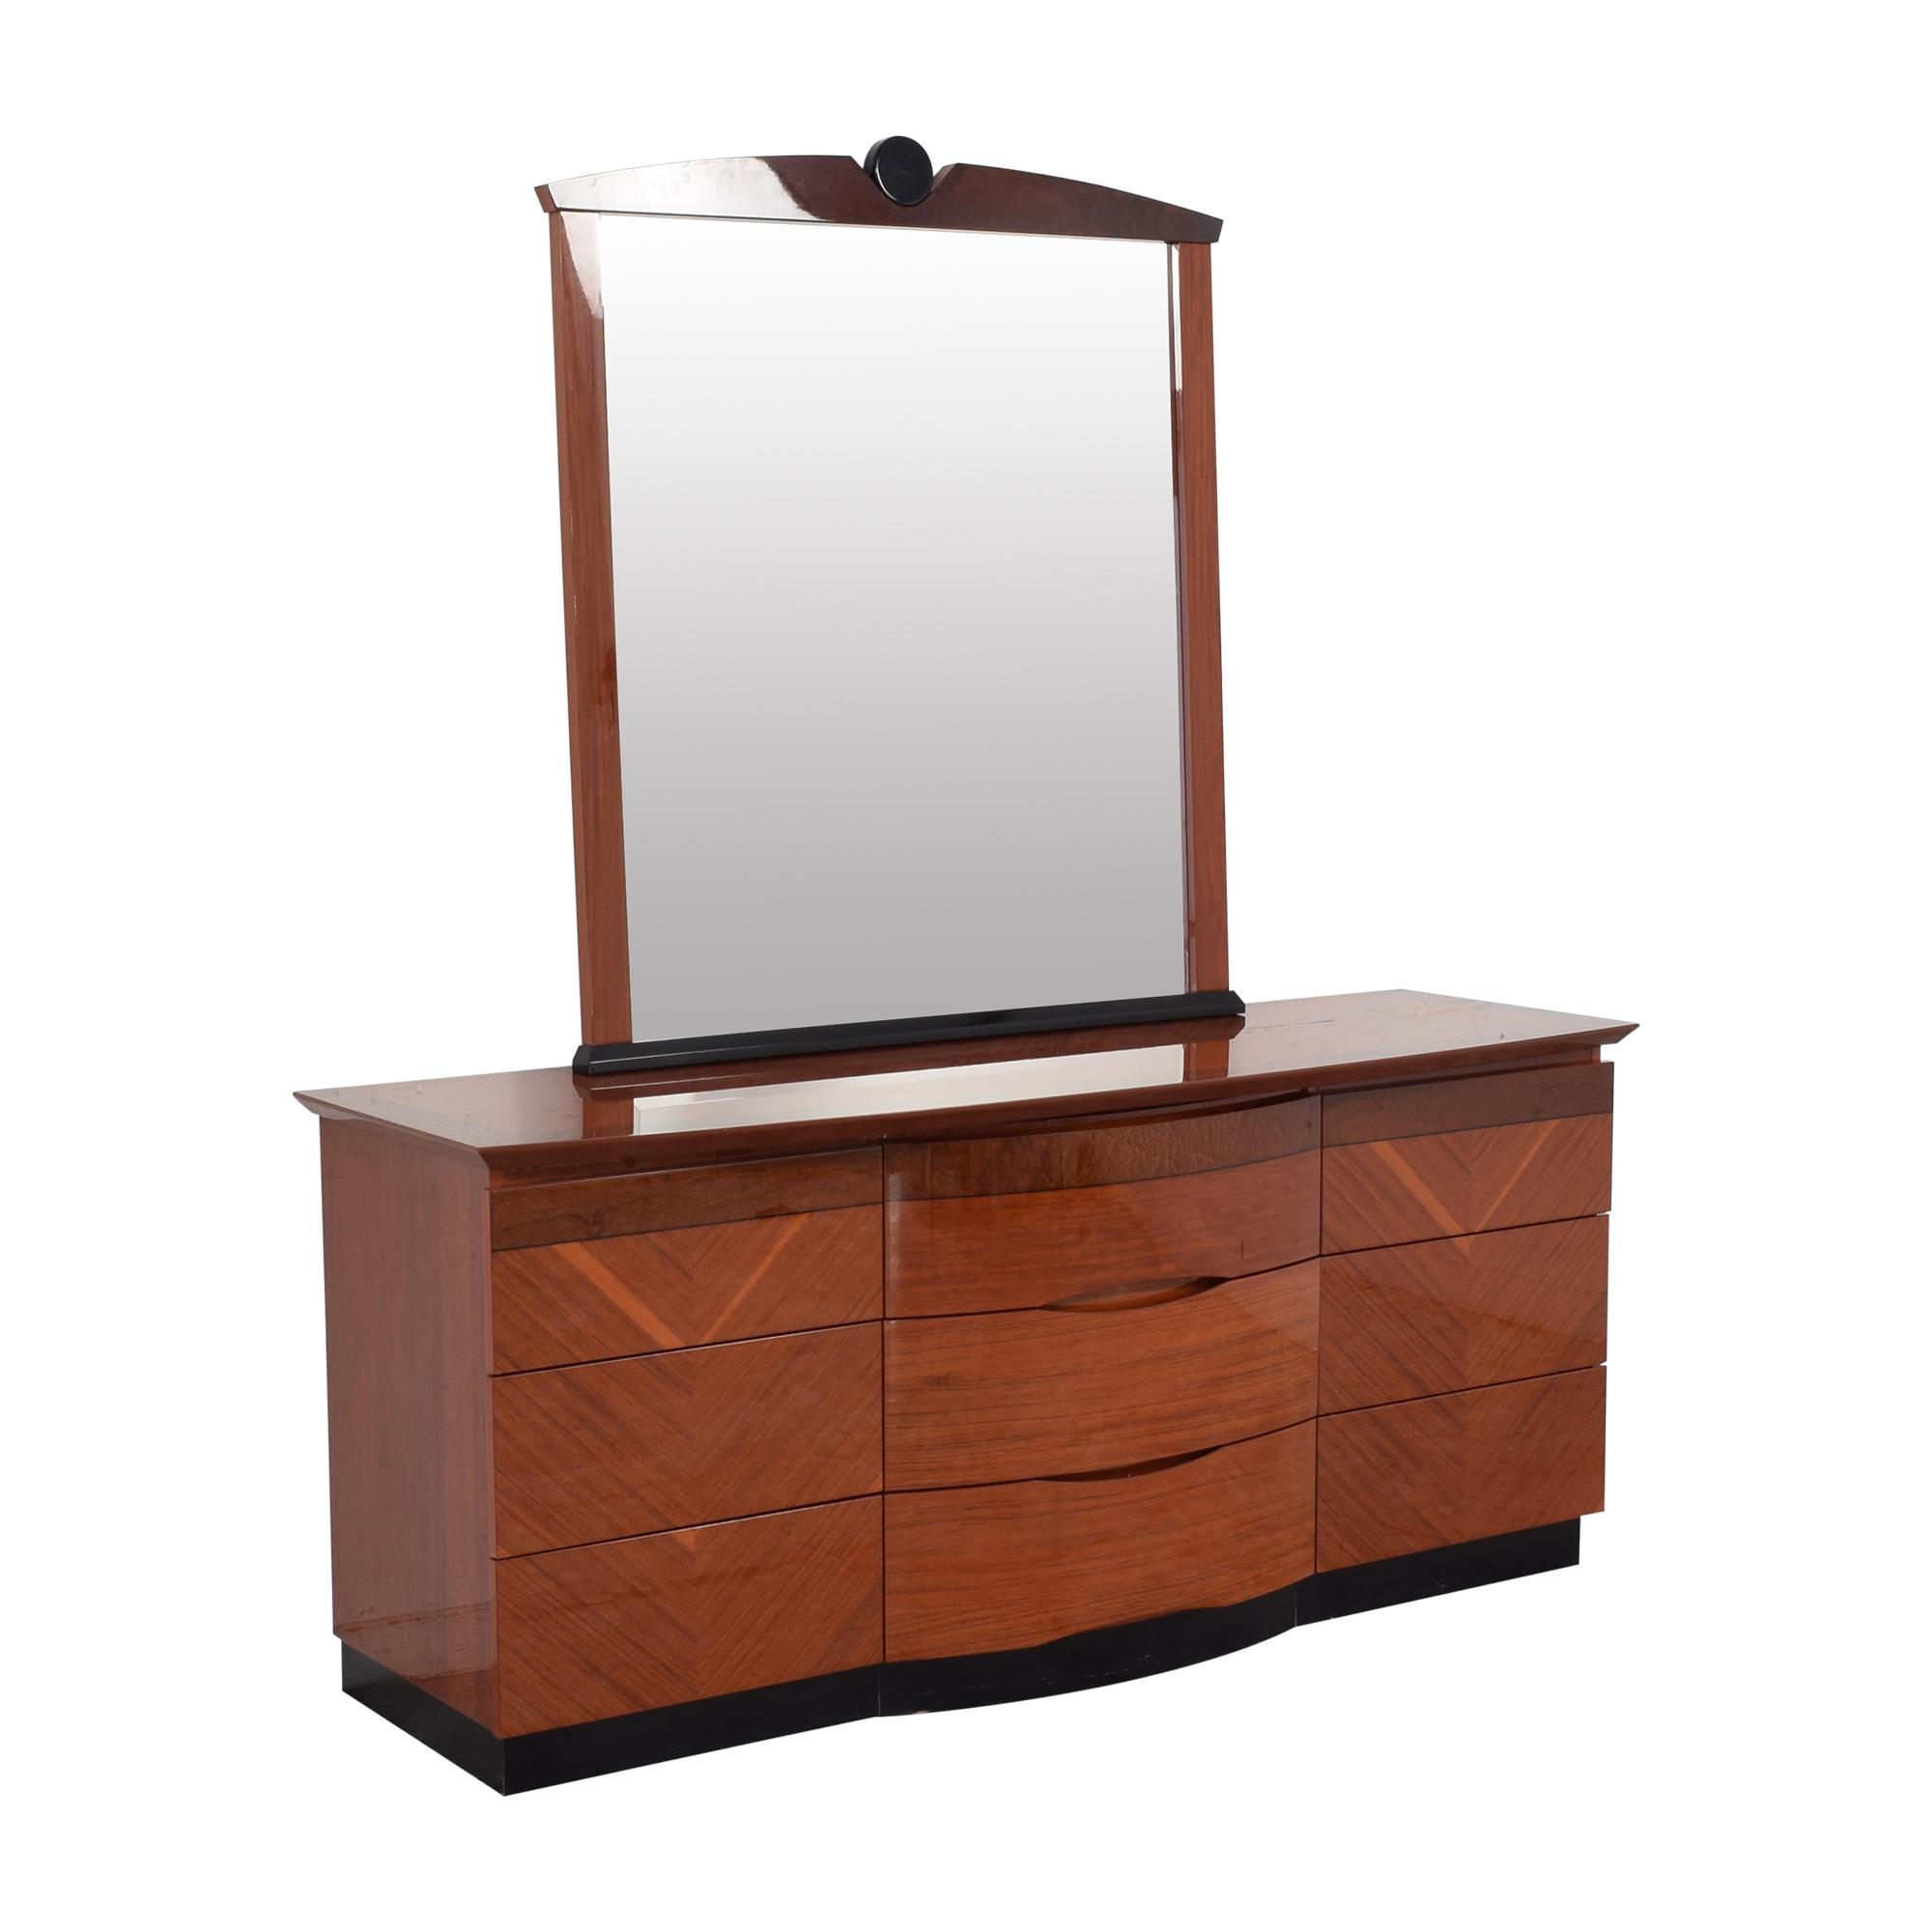 Custom Dresser with Mirror dimensions